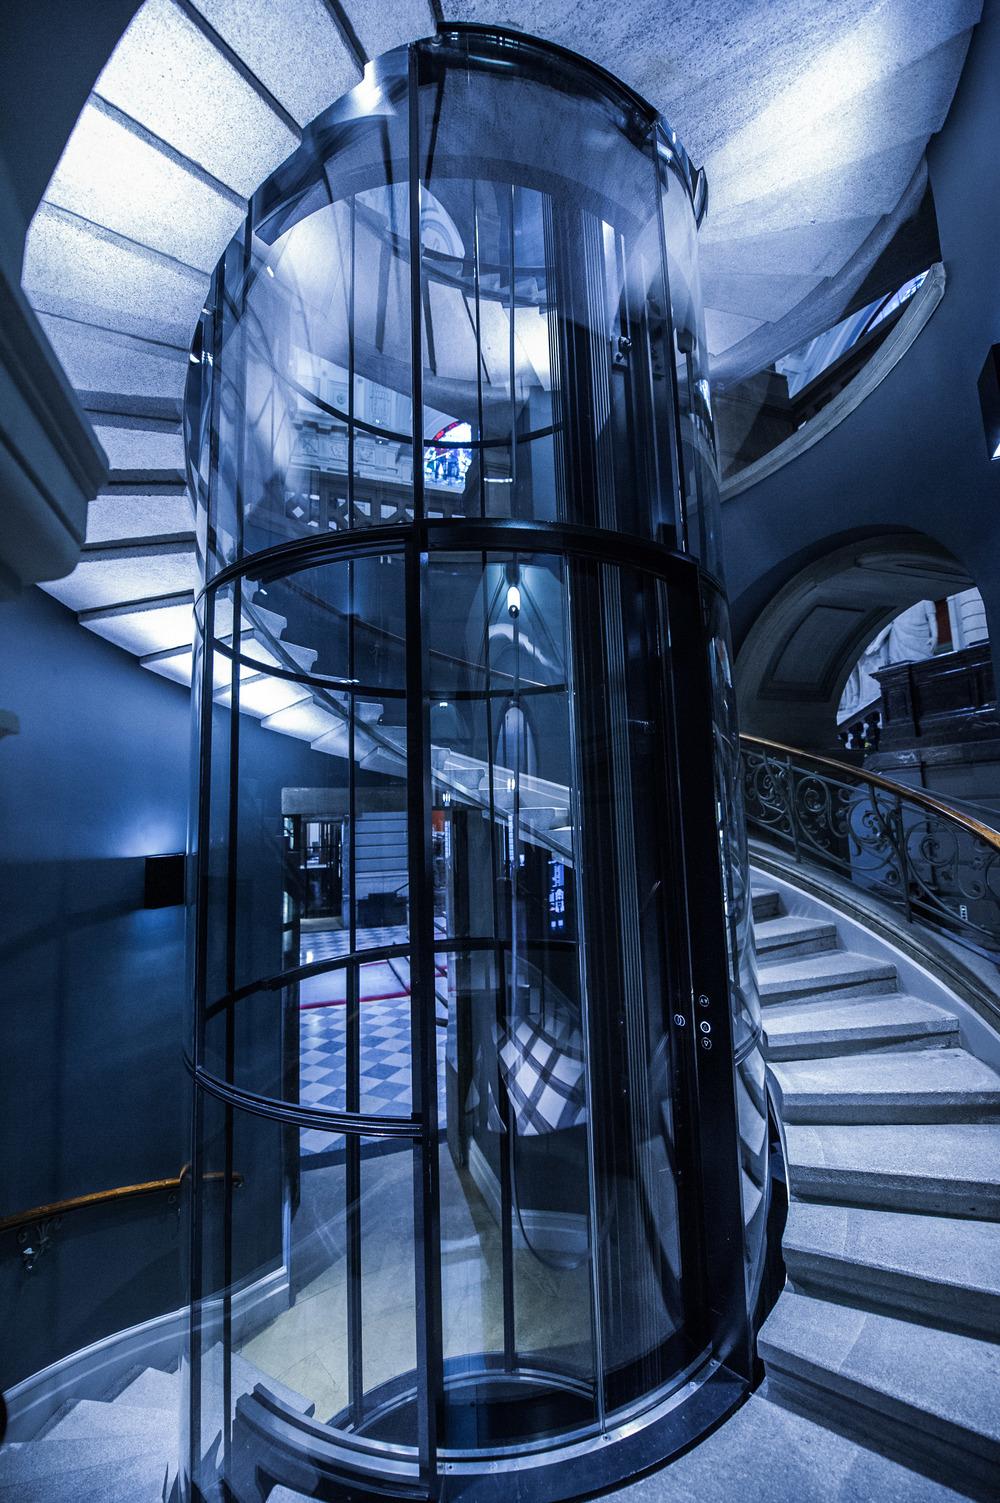 Bundeshaus Lift.jpg